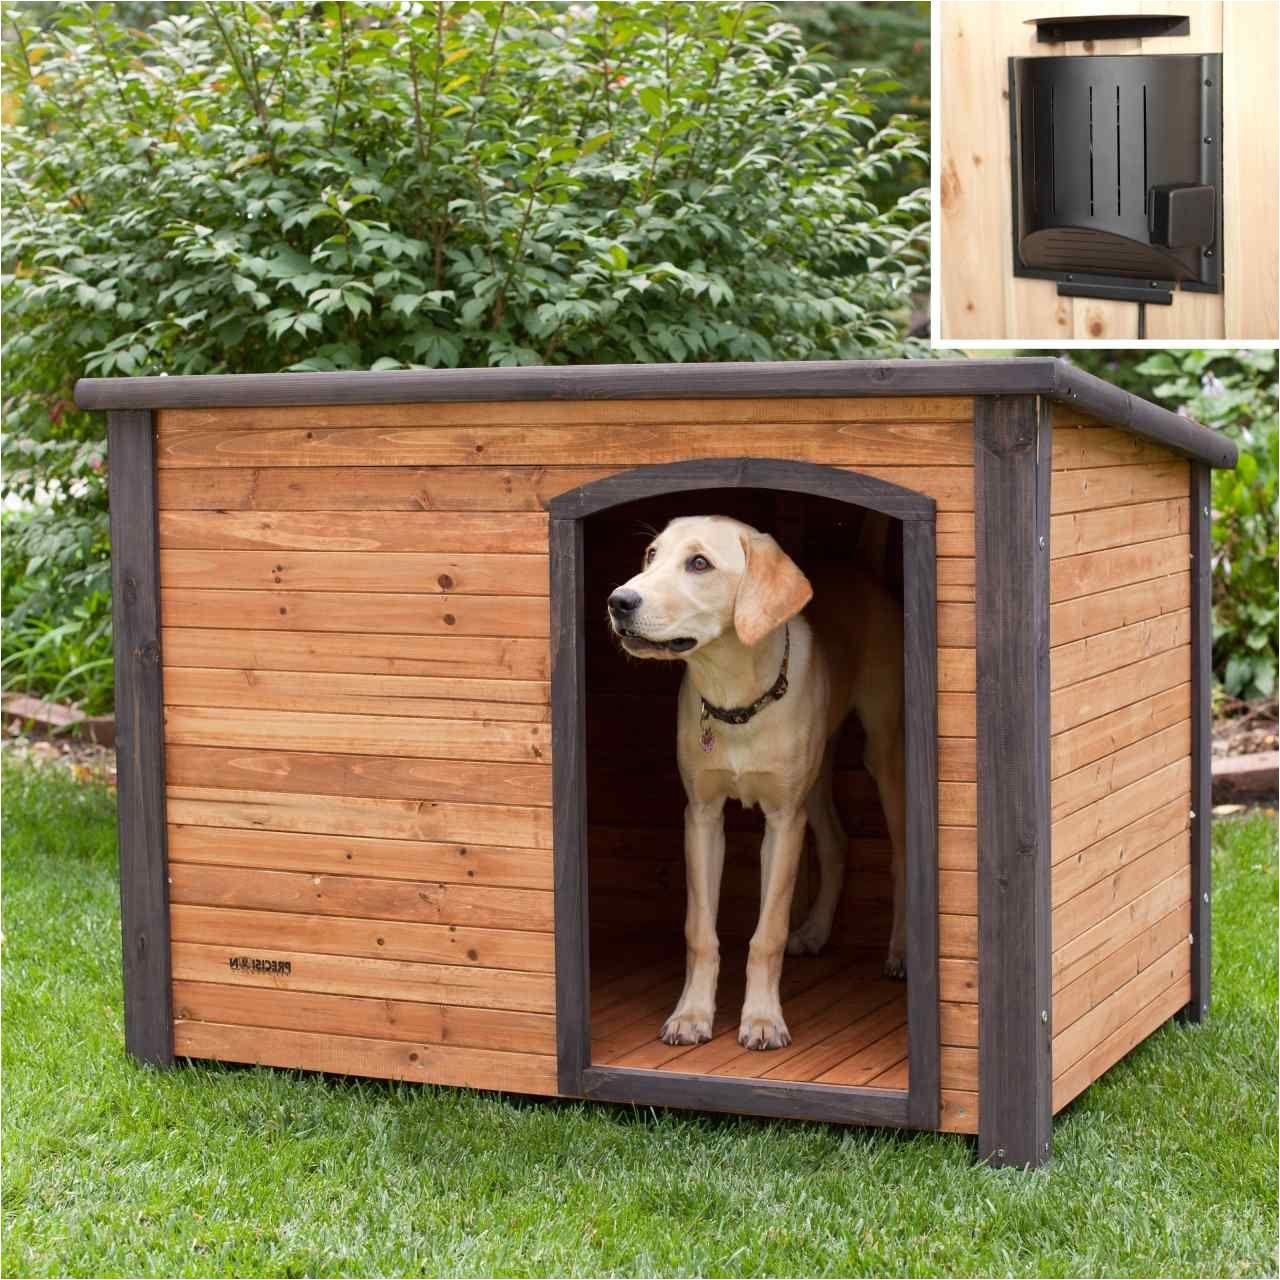 Dog House Heat Lamp Ideas Dog House Outdoor Dog House Homemade